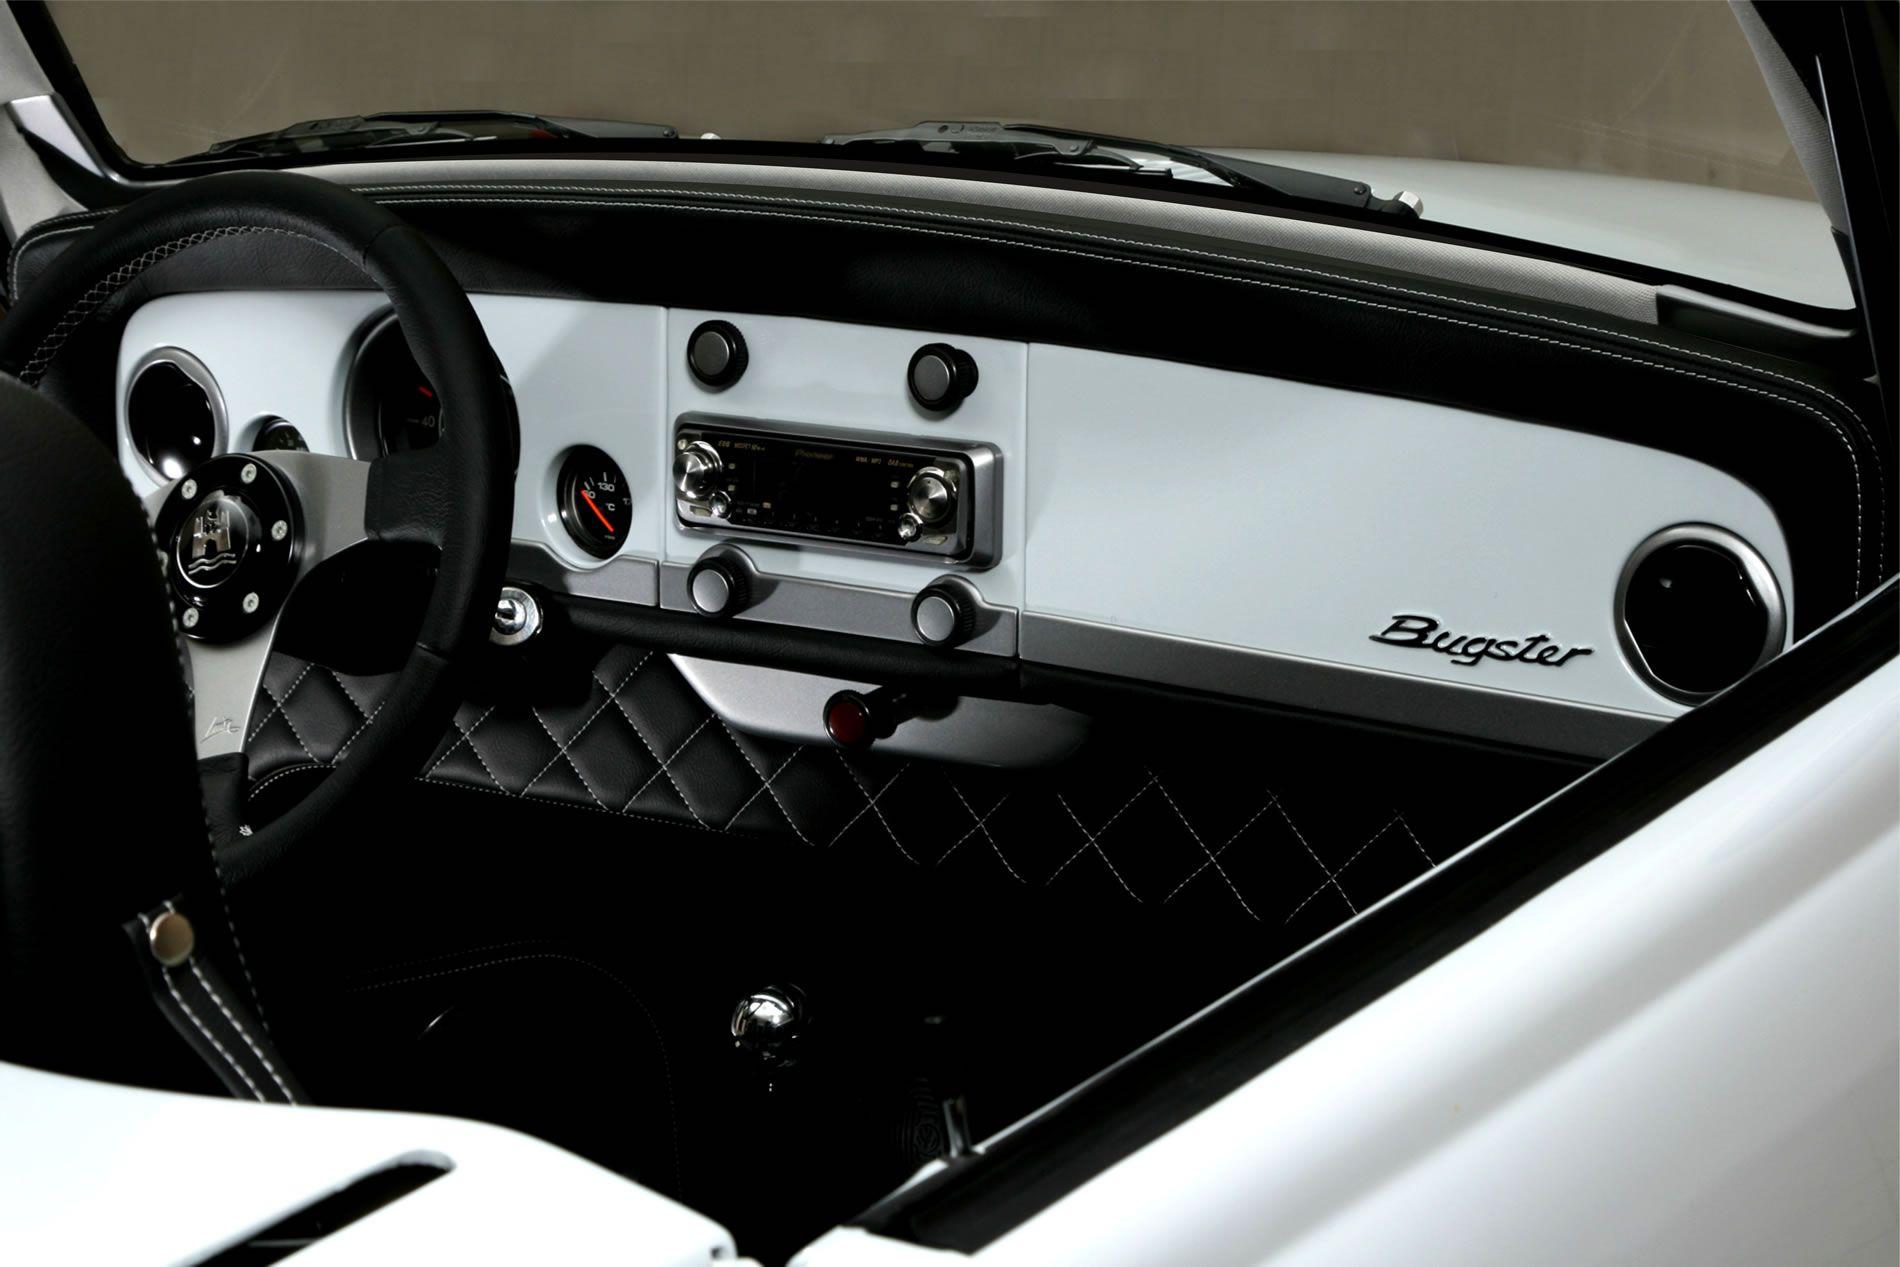 Ziovas Bugster VW Beetle roadster custom dashboard